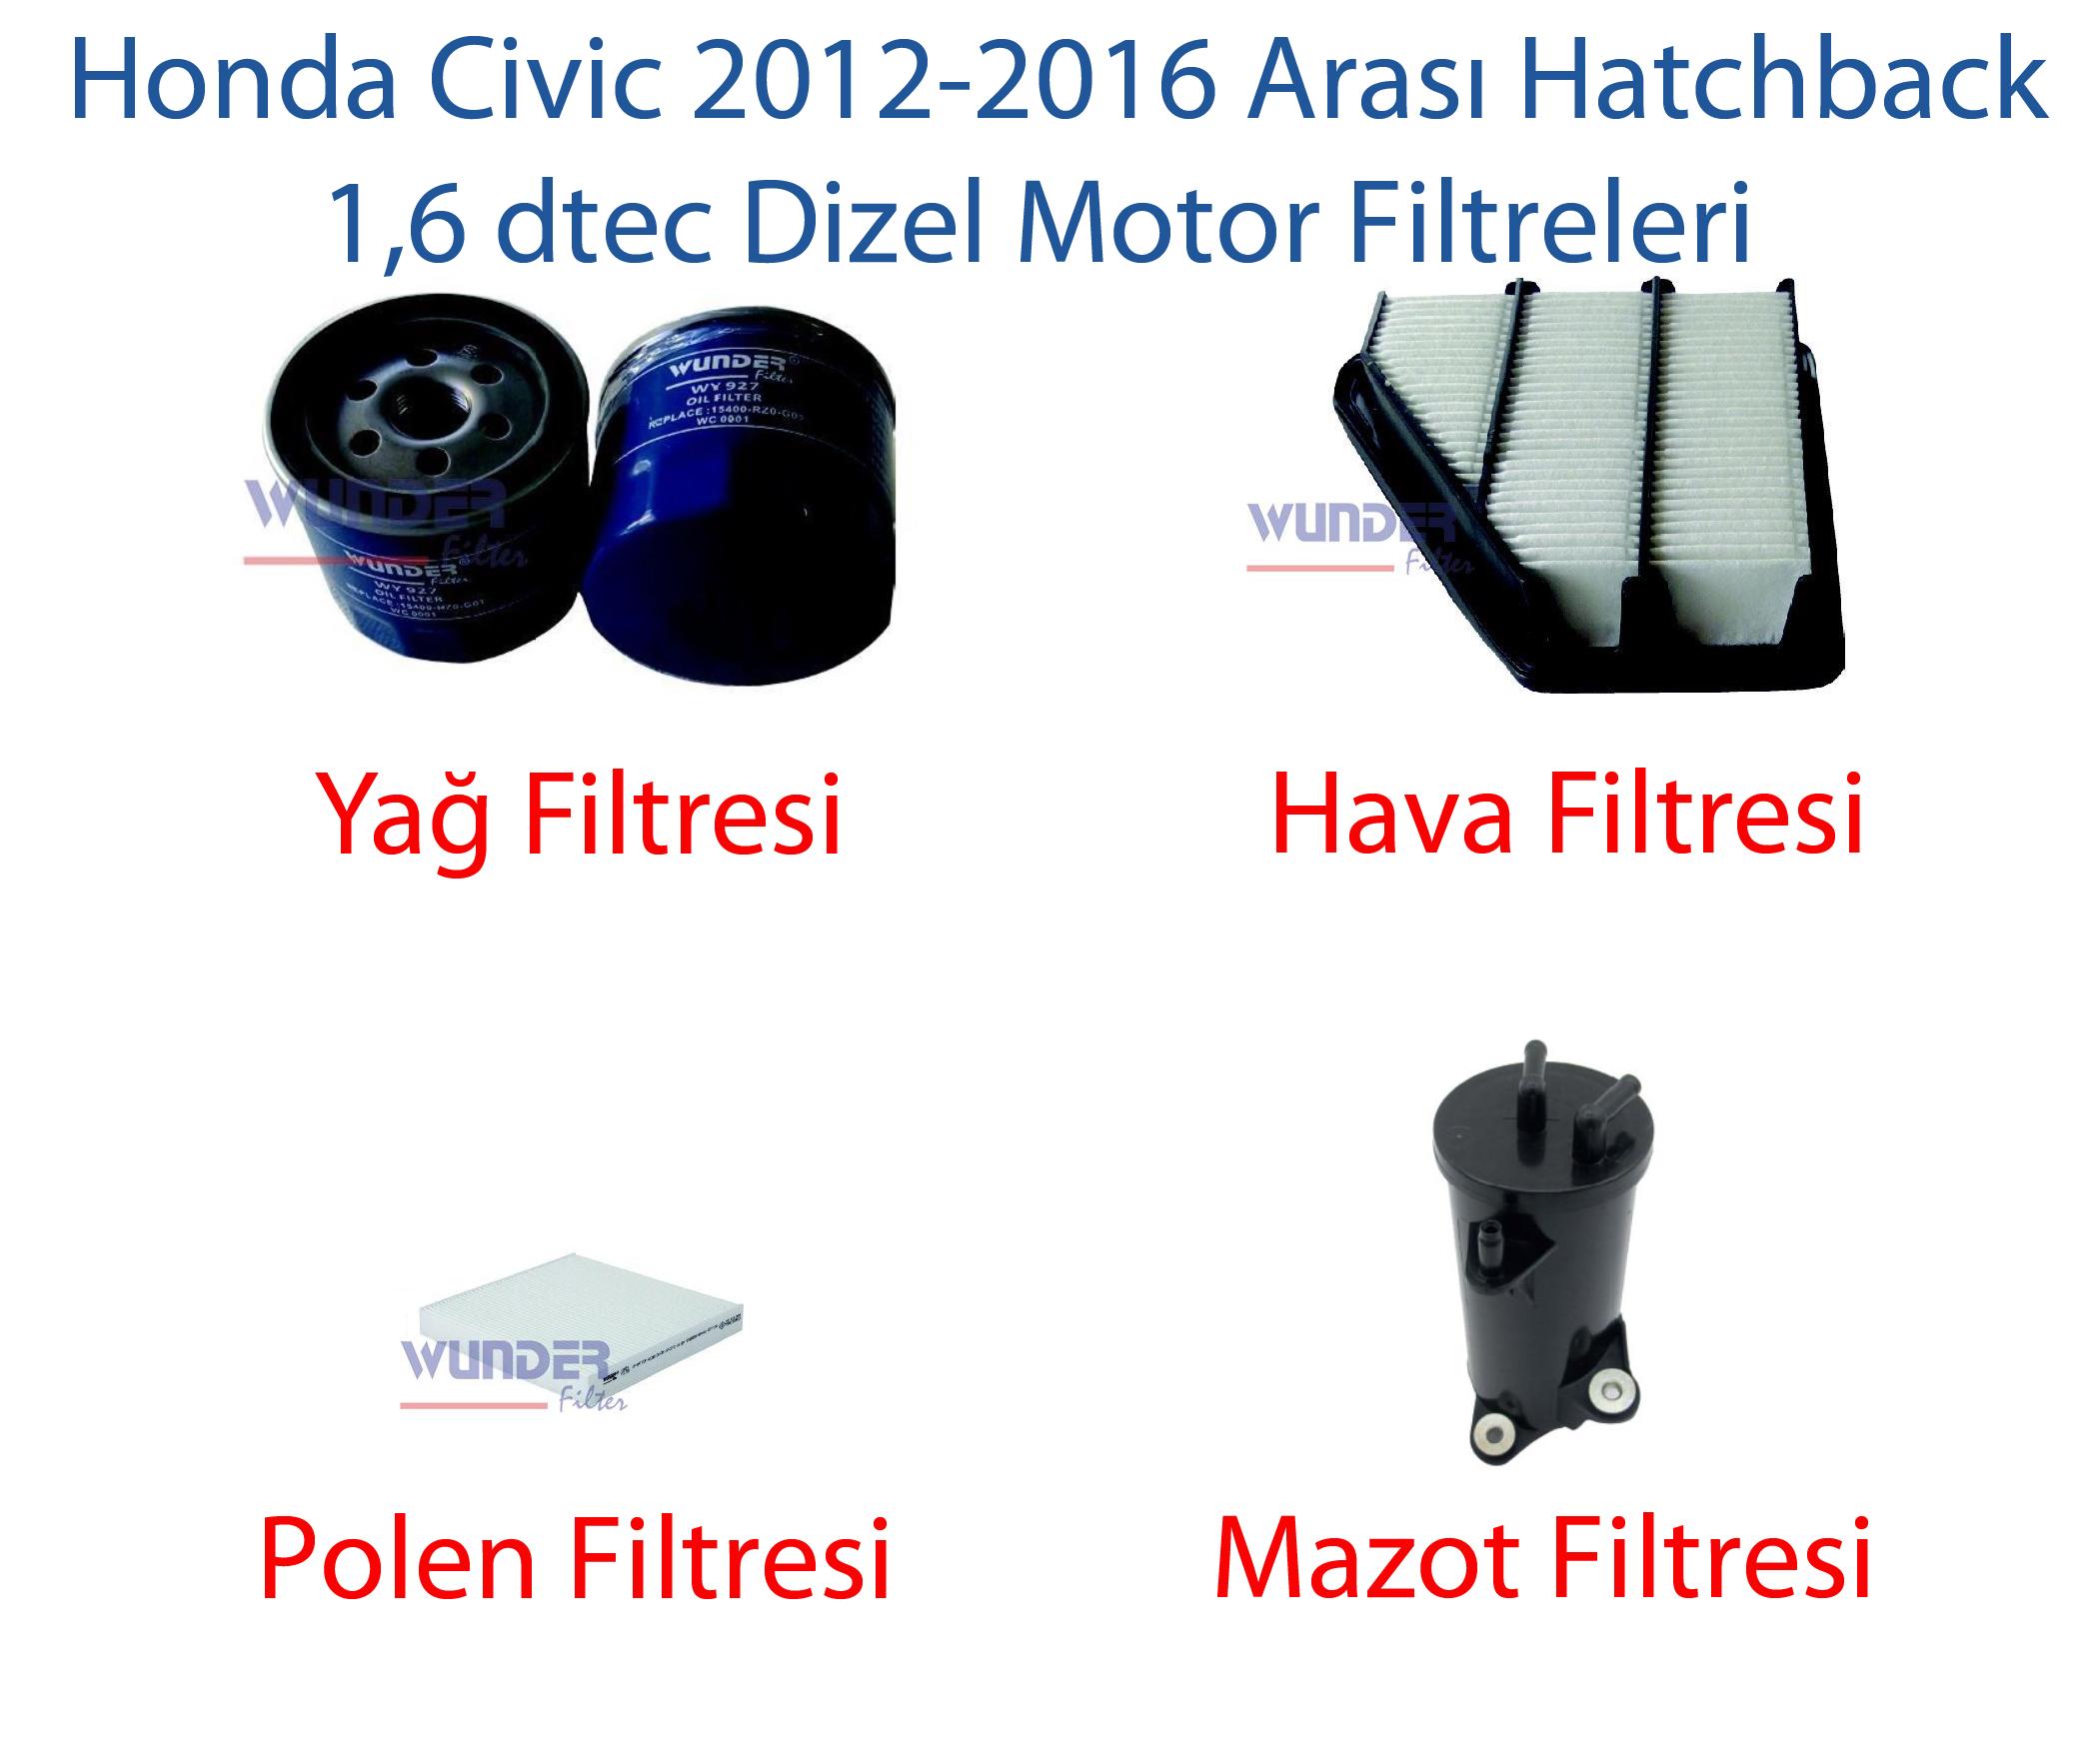 Honda Civic HB 2012-2016 1,6 DTEC - YAĞ HAVA POLEN MAZOT FİLTRESİ